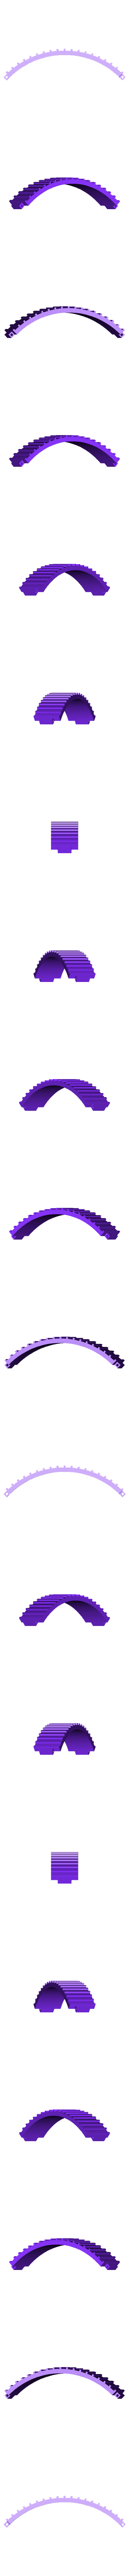 bridge top crans 1.6 scx24.STL Download STL file Axial SCX24 Crawler high bridge • 3D print model, lulu3Dbuilder